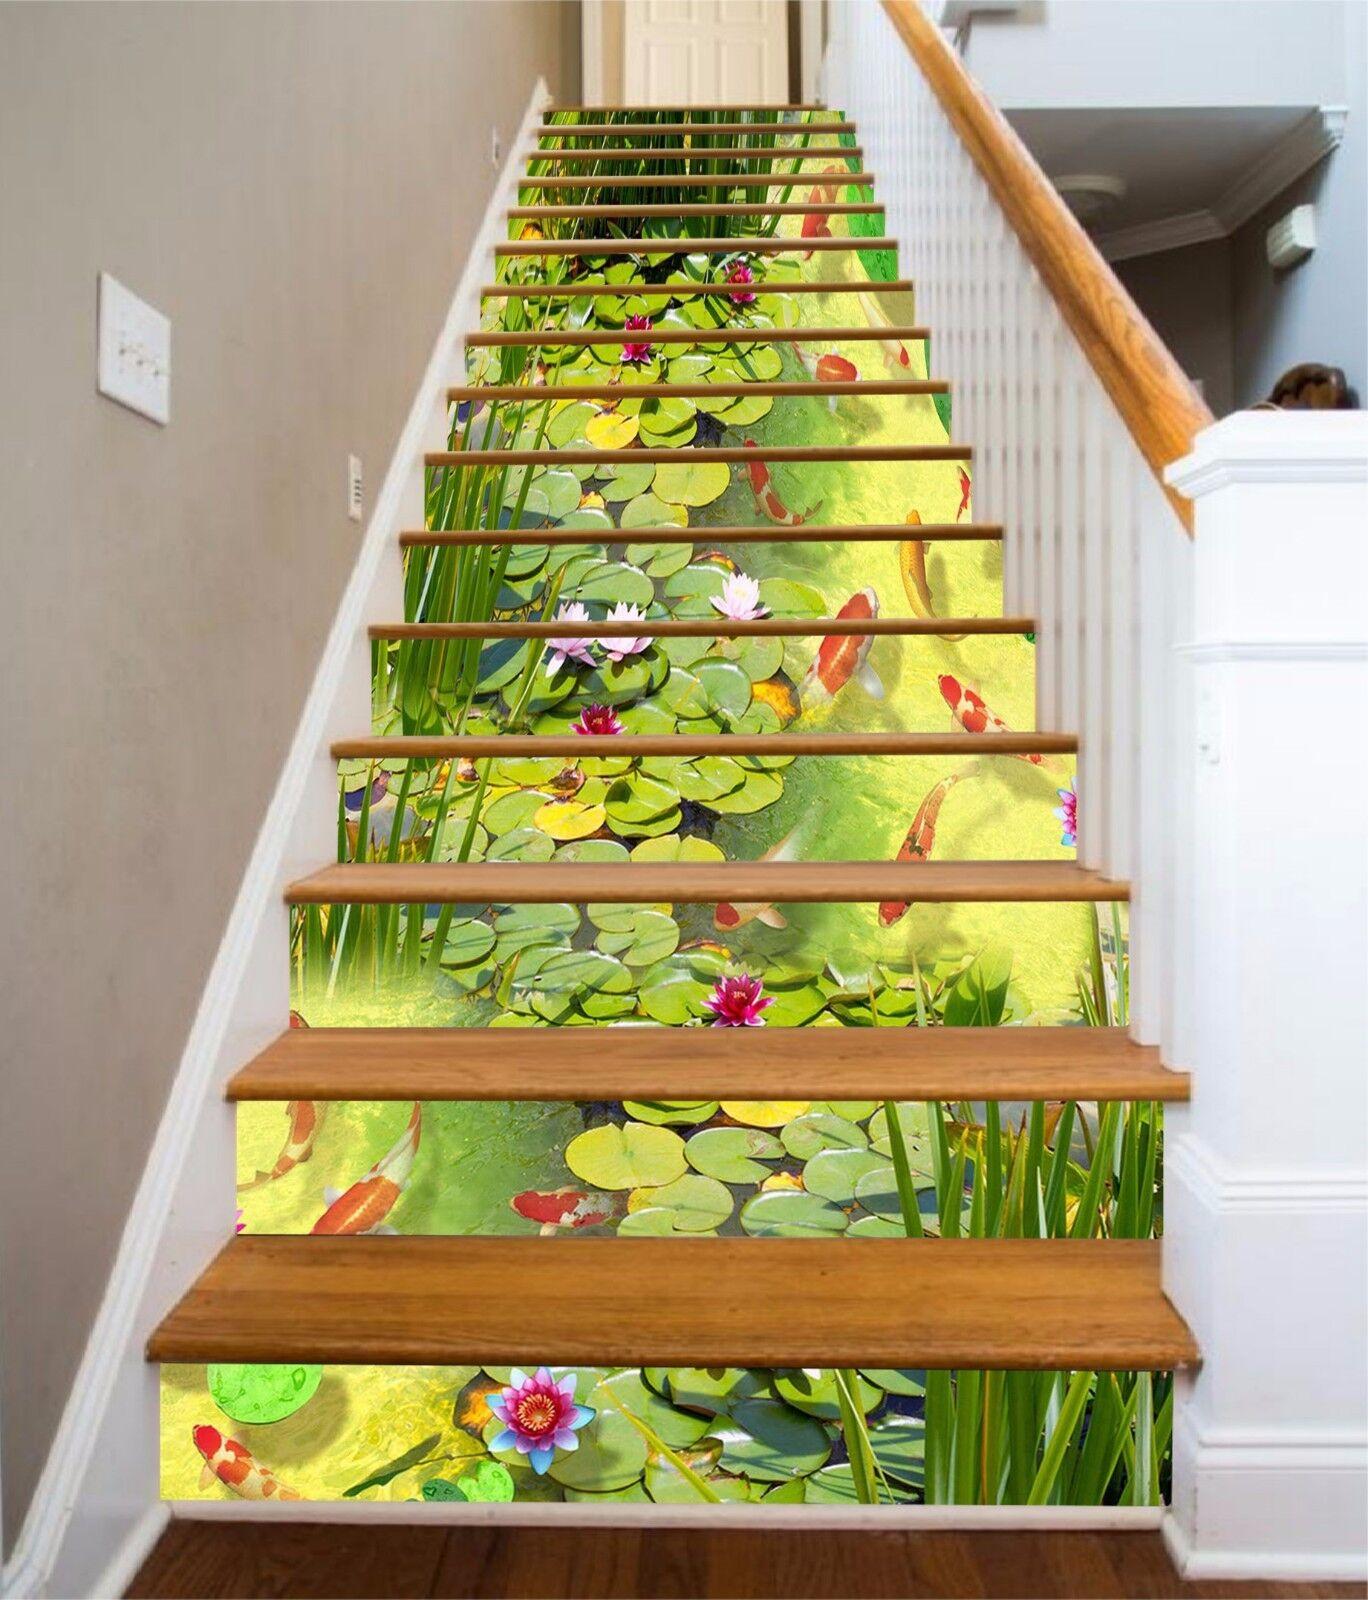 3D Grün pond fish7 Stair Risers Decoration Photo Mural Vinyl Decal Wallpaper UK